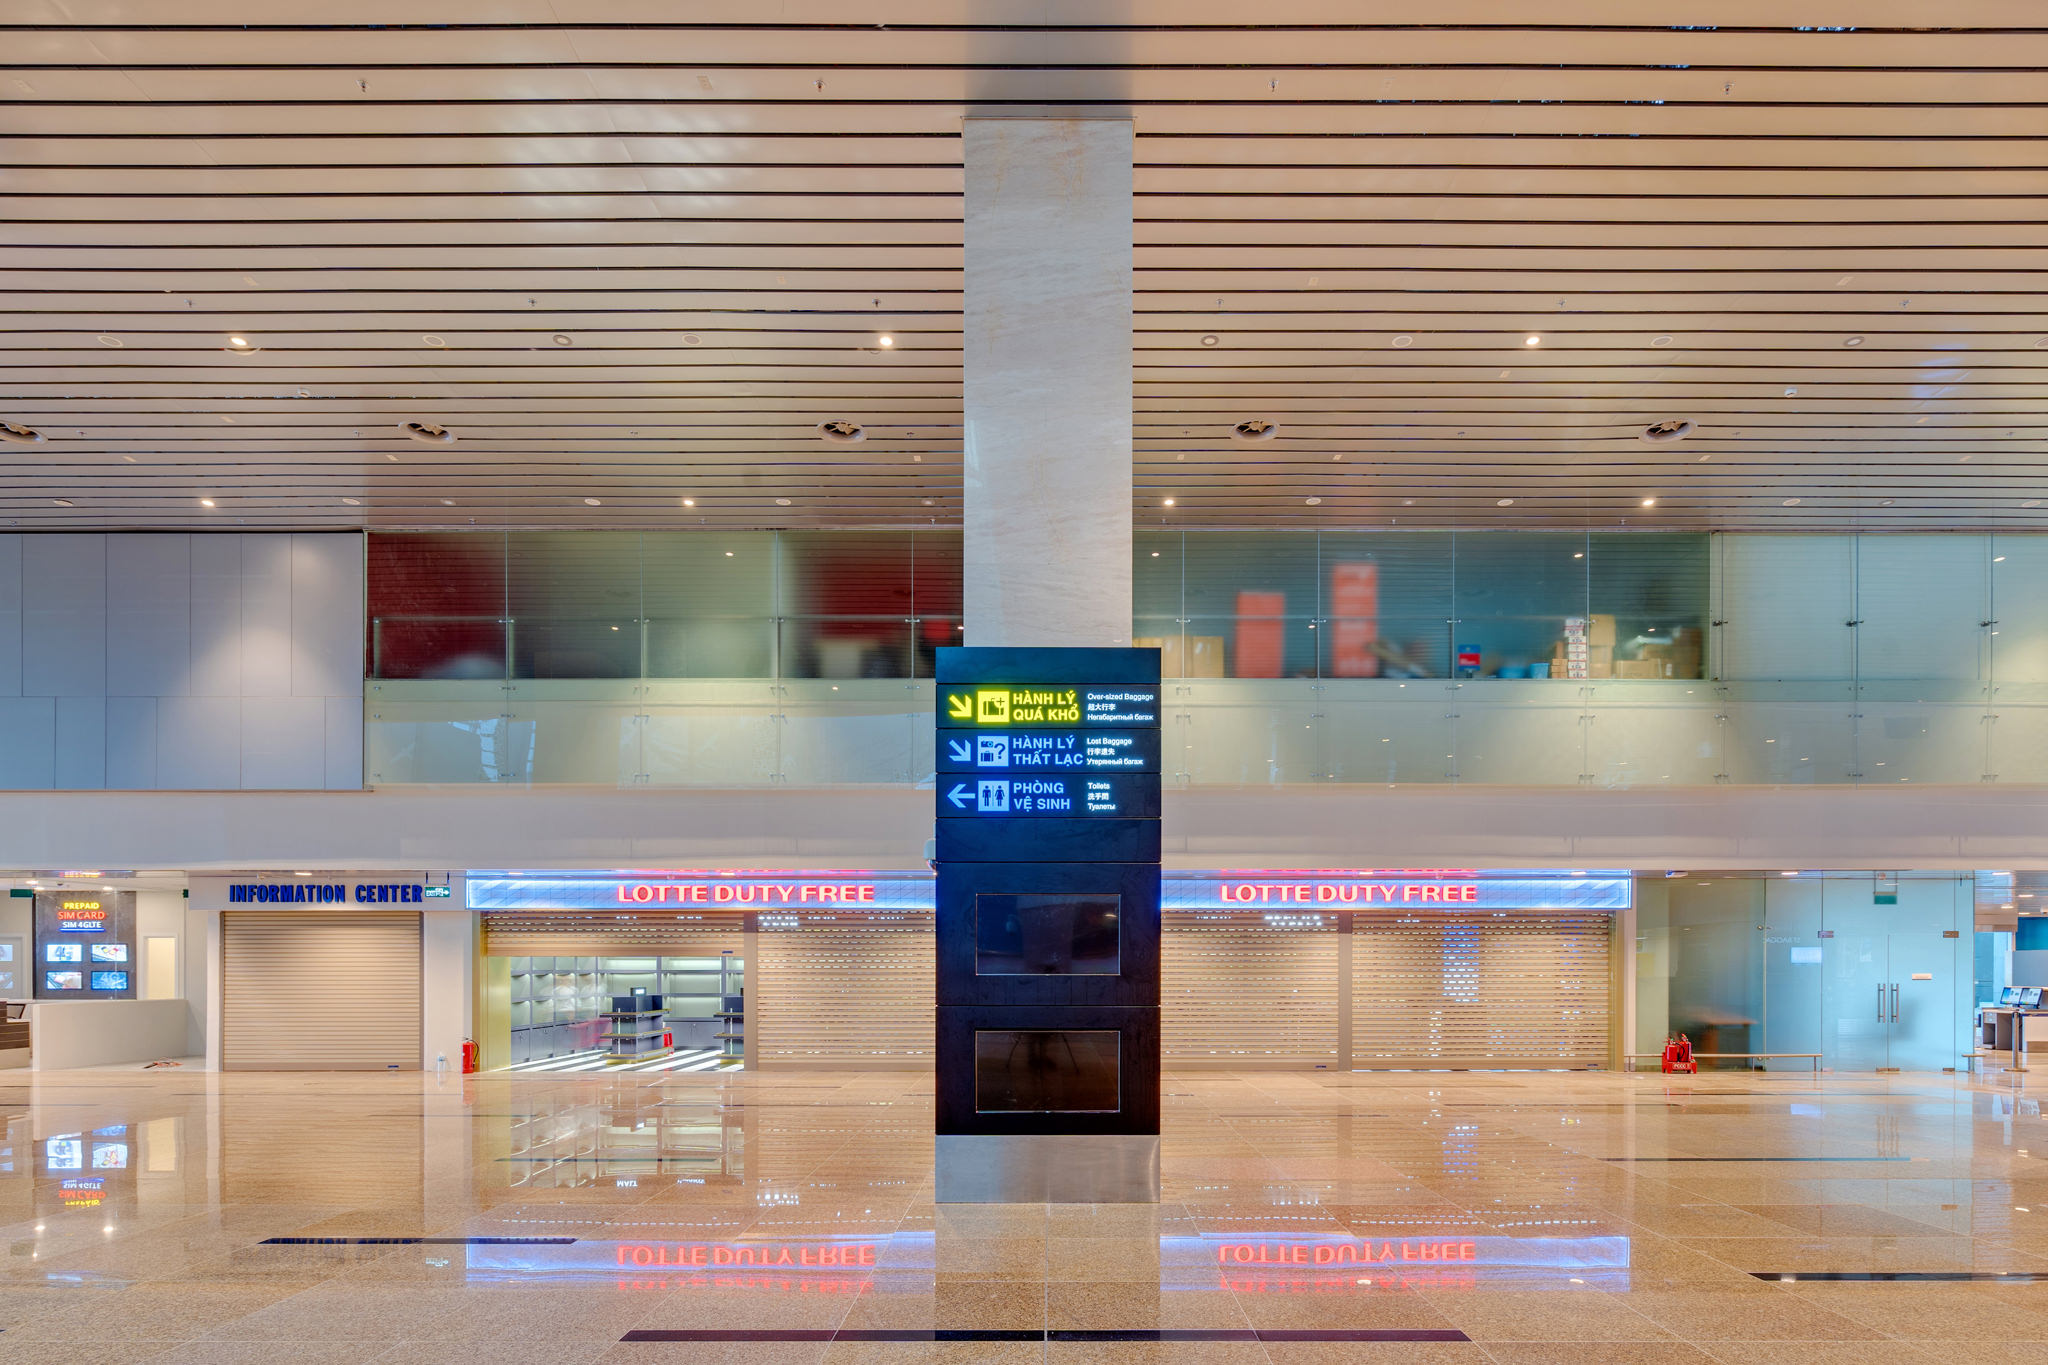 20180626 - Cam Ranh Airport - Architecture - 0142.jpg